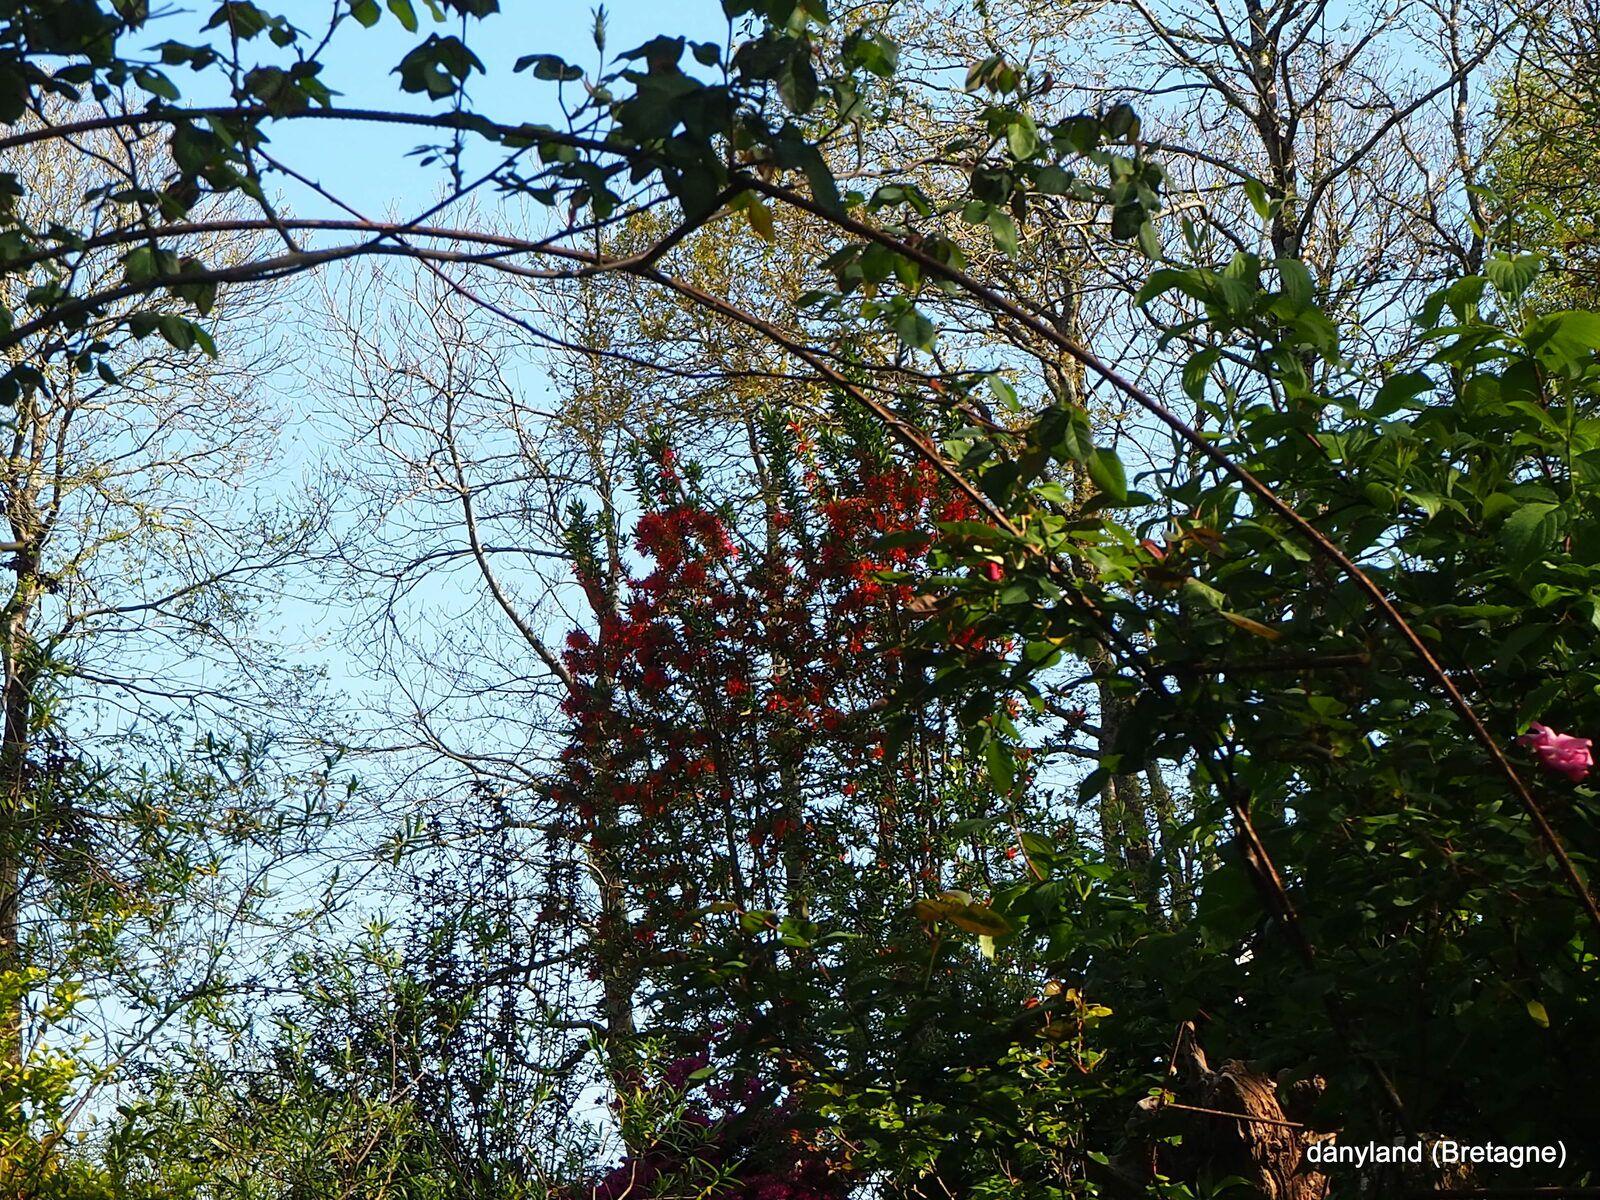 le jardin de danyland le 25 avril 21